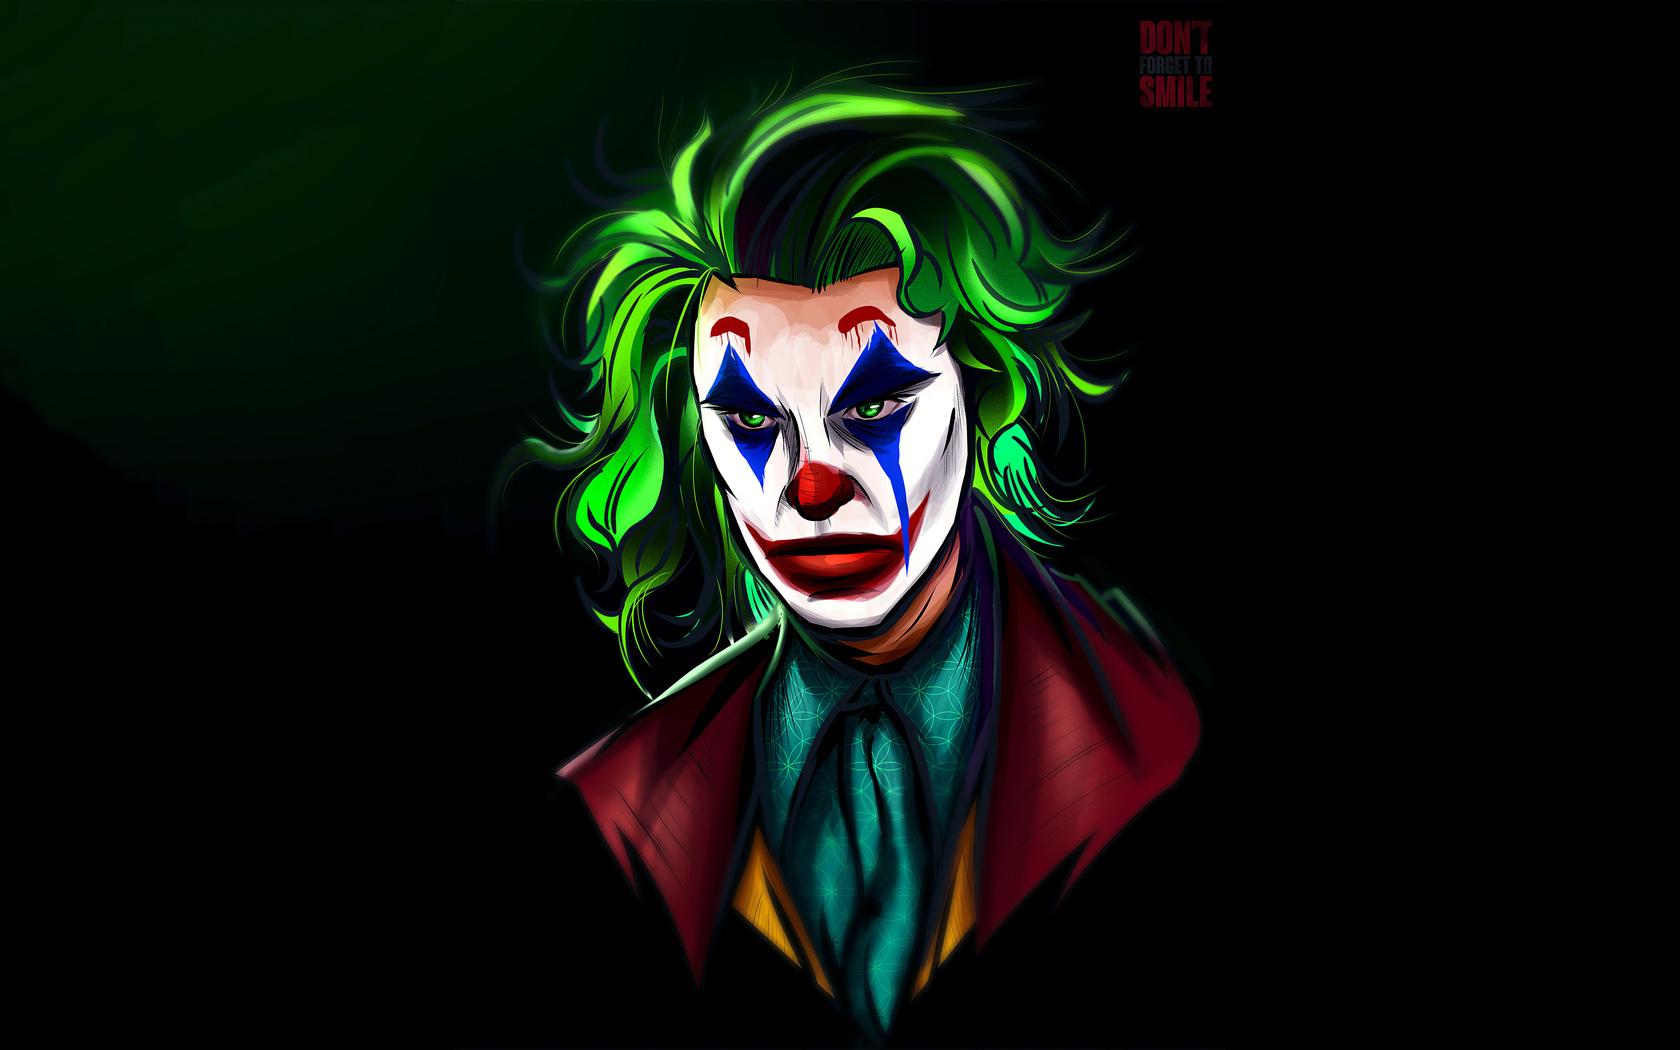 1680x1050 Joker Man 4k 1680x1050 Resolution HD 4k ...